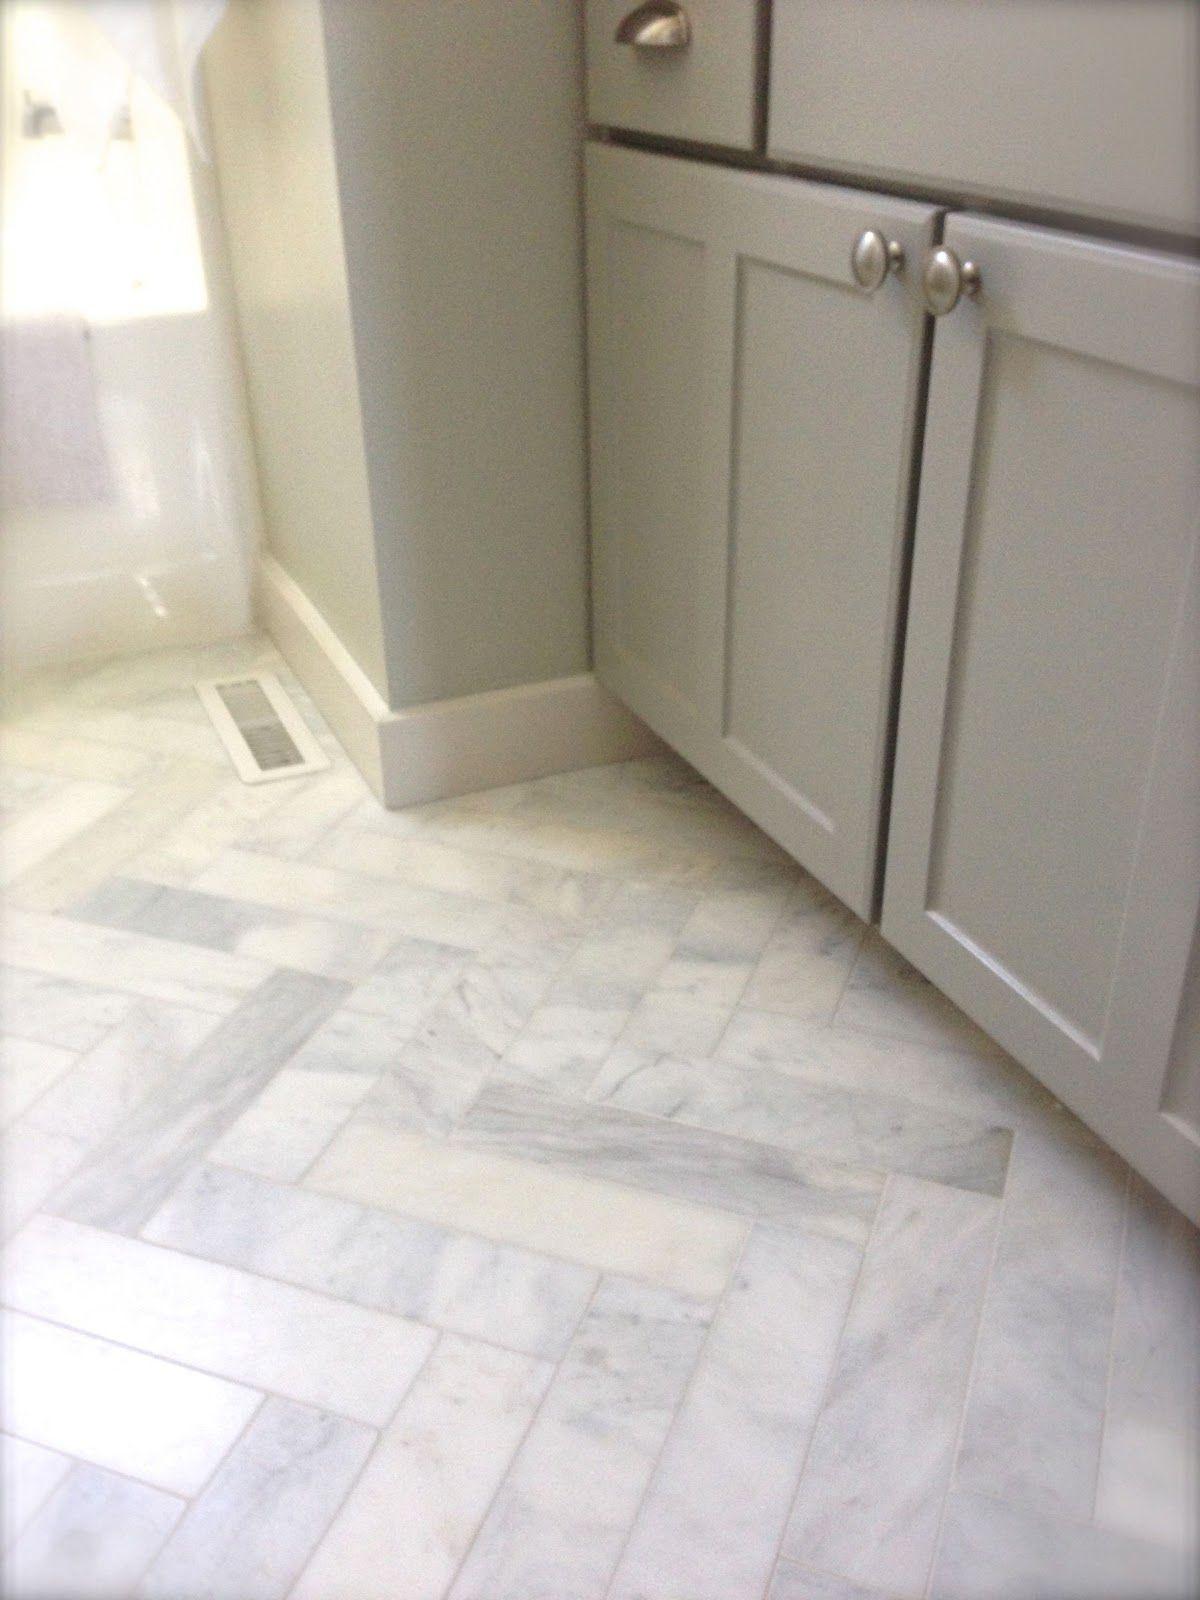 Bath Floor Jpg 1 200 1 600 Pixels Marble Bathroom Floor Bathroom Design Bathroom Makeover